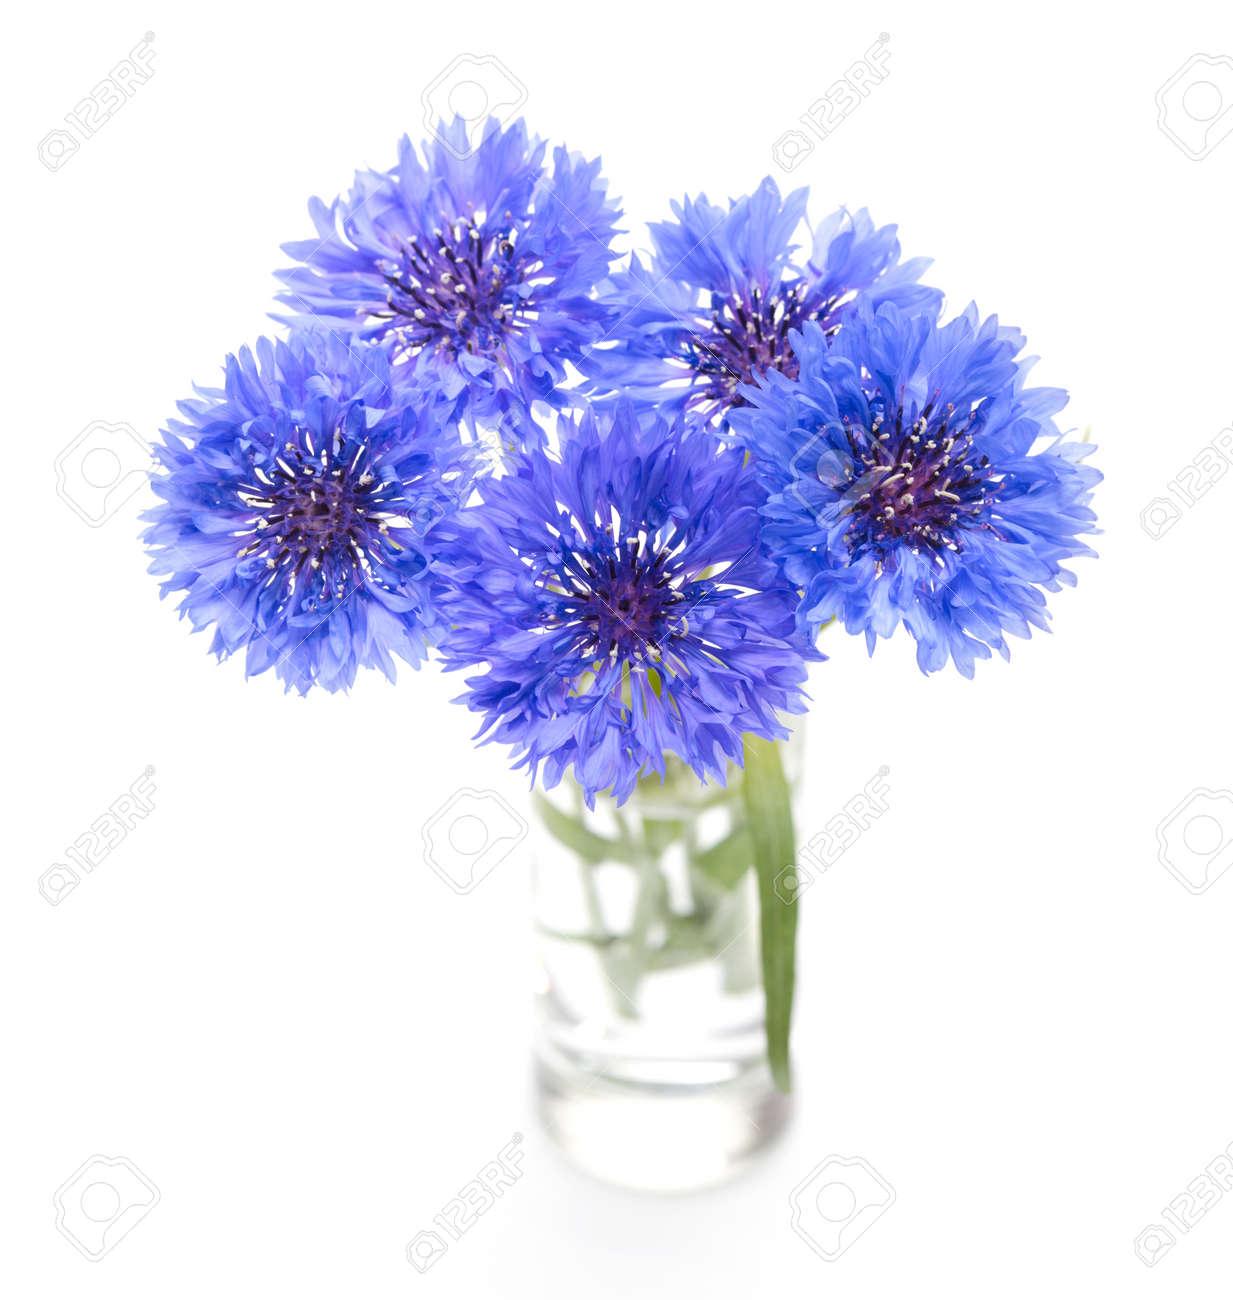 Blue Cornflower Flower Bouquet Isolated On White Stock Photo ...